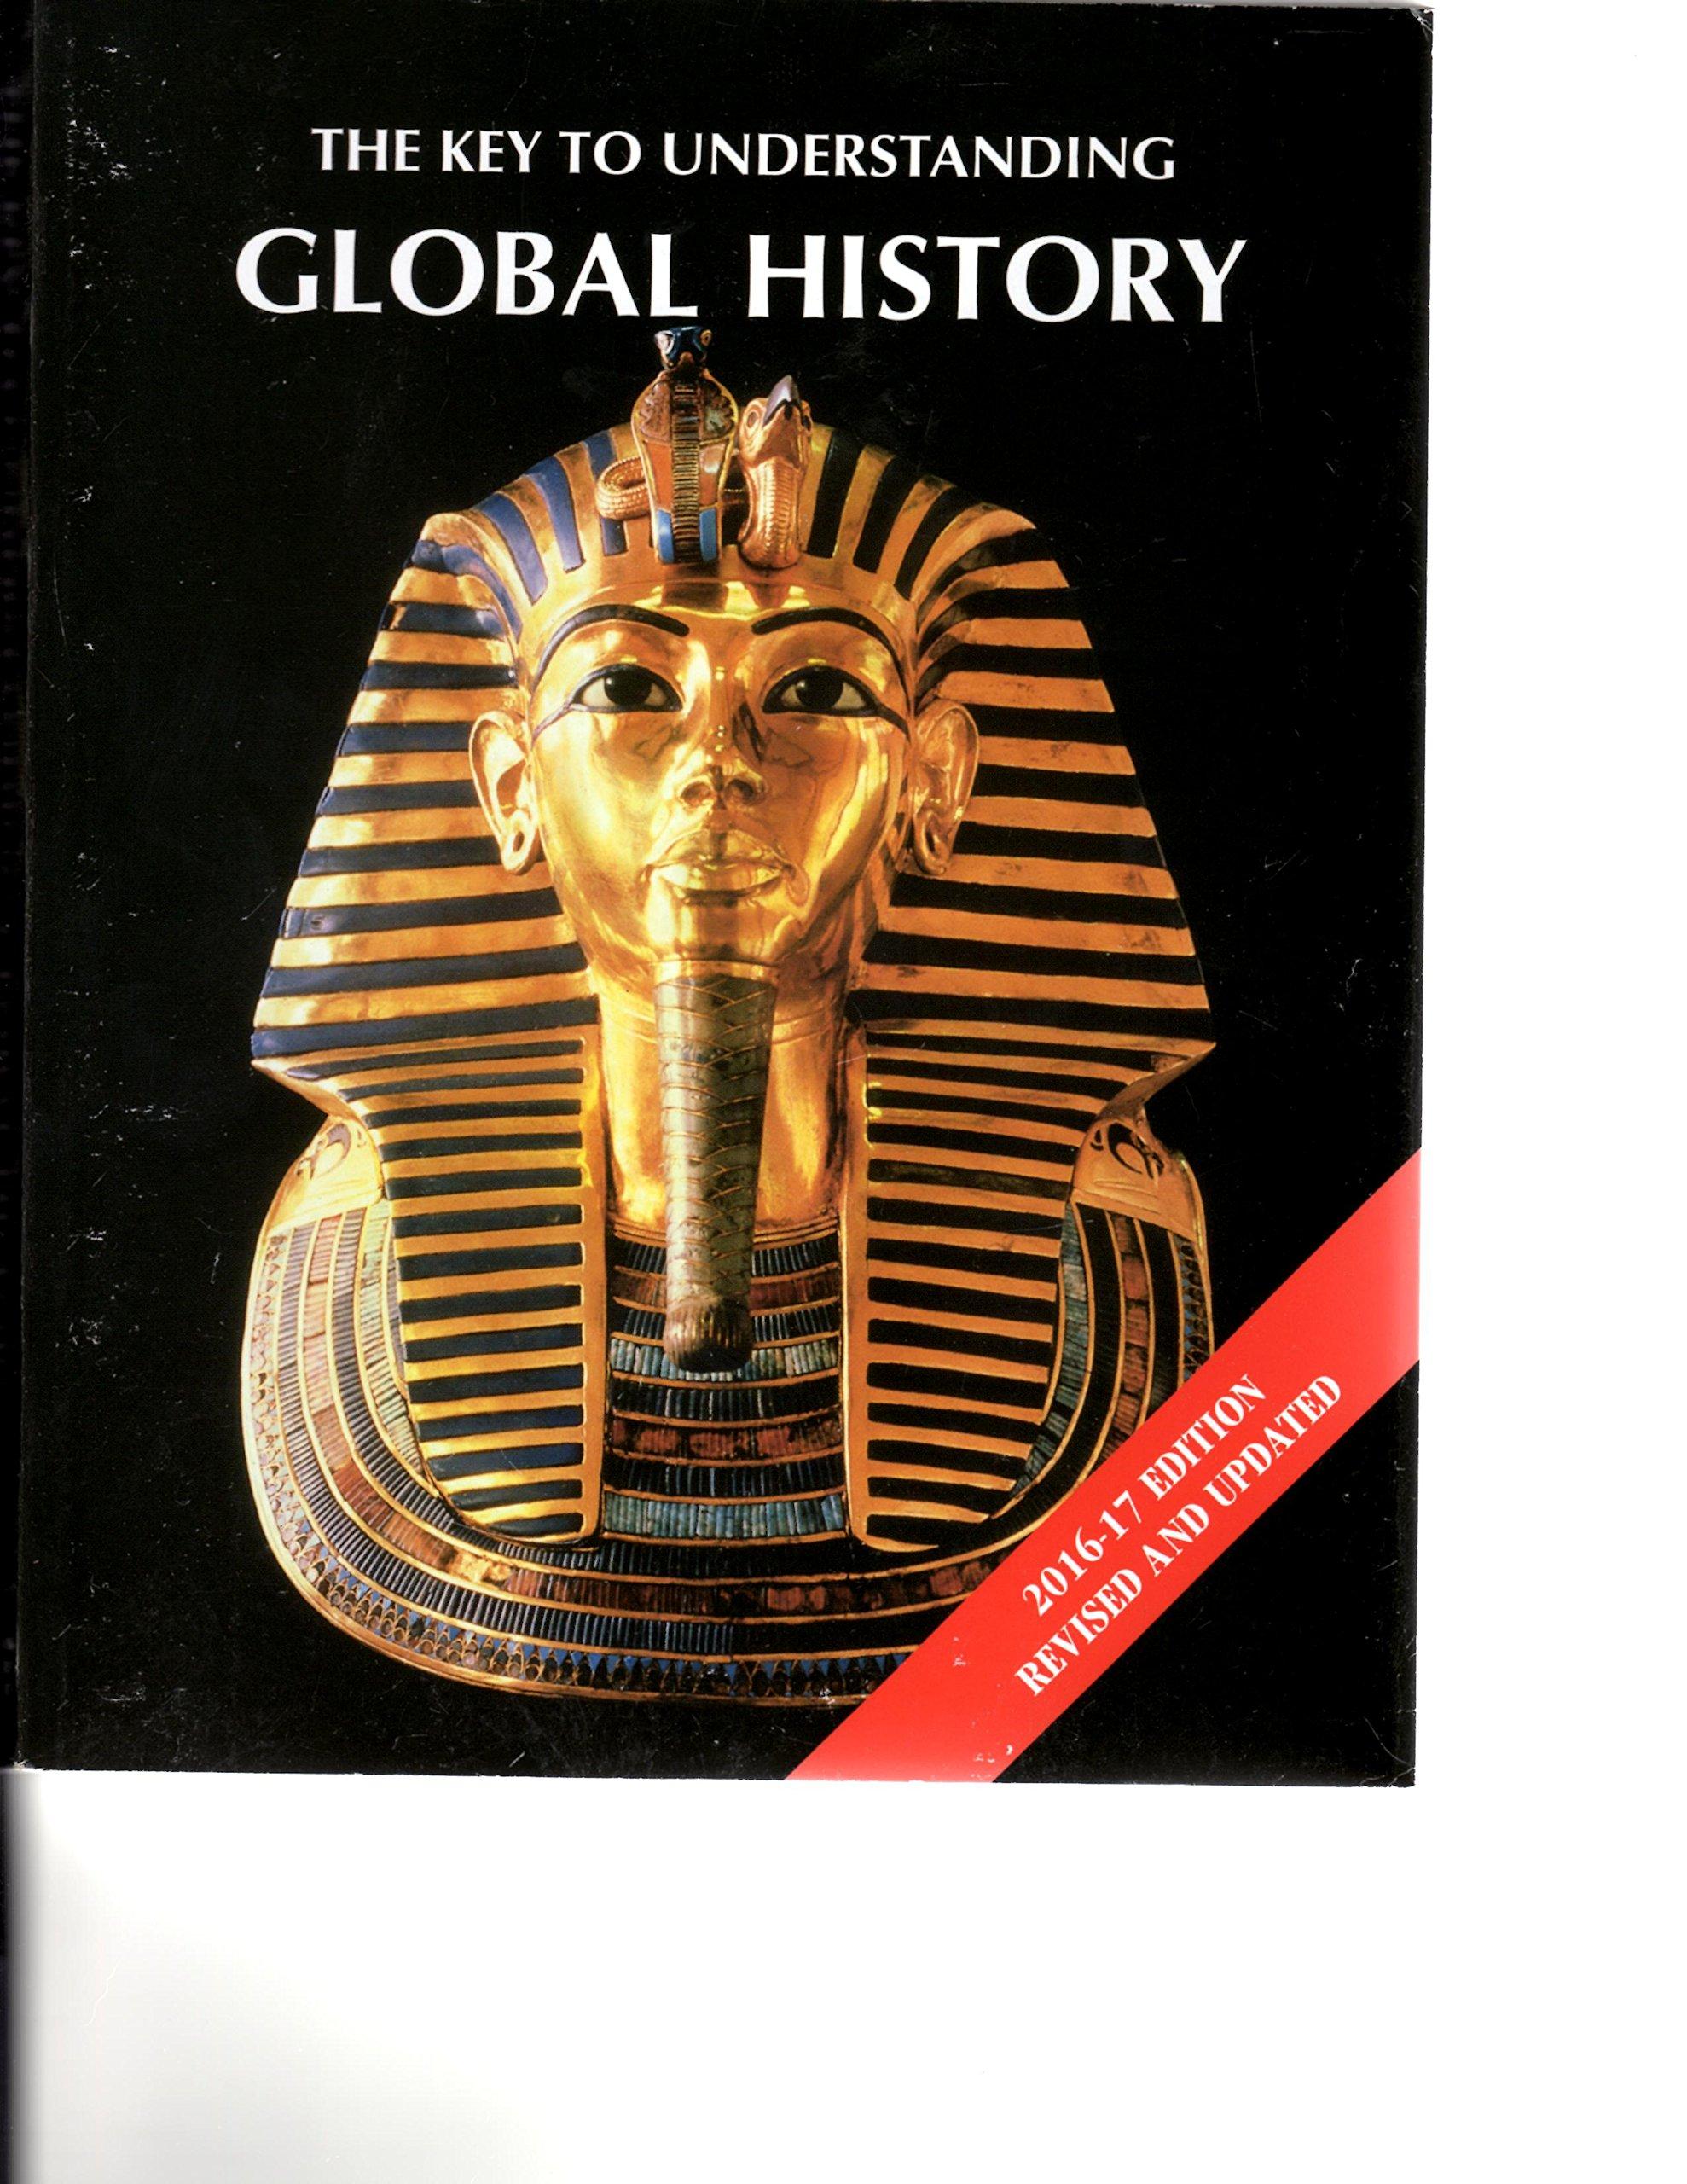 jarrett book world history answer key